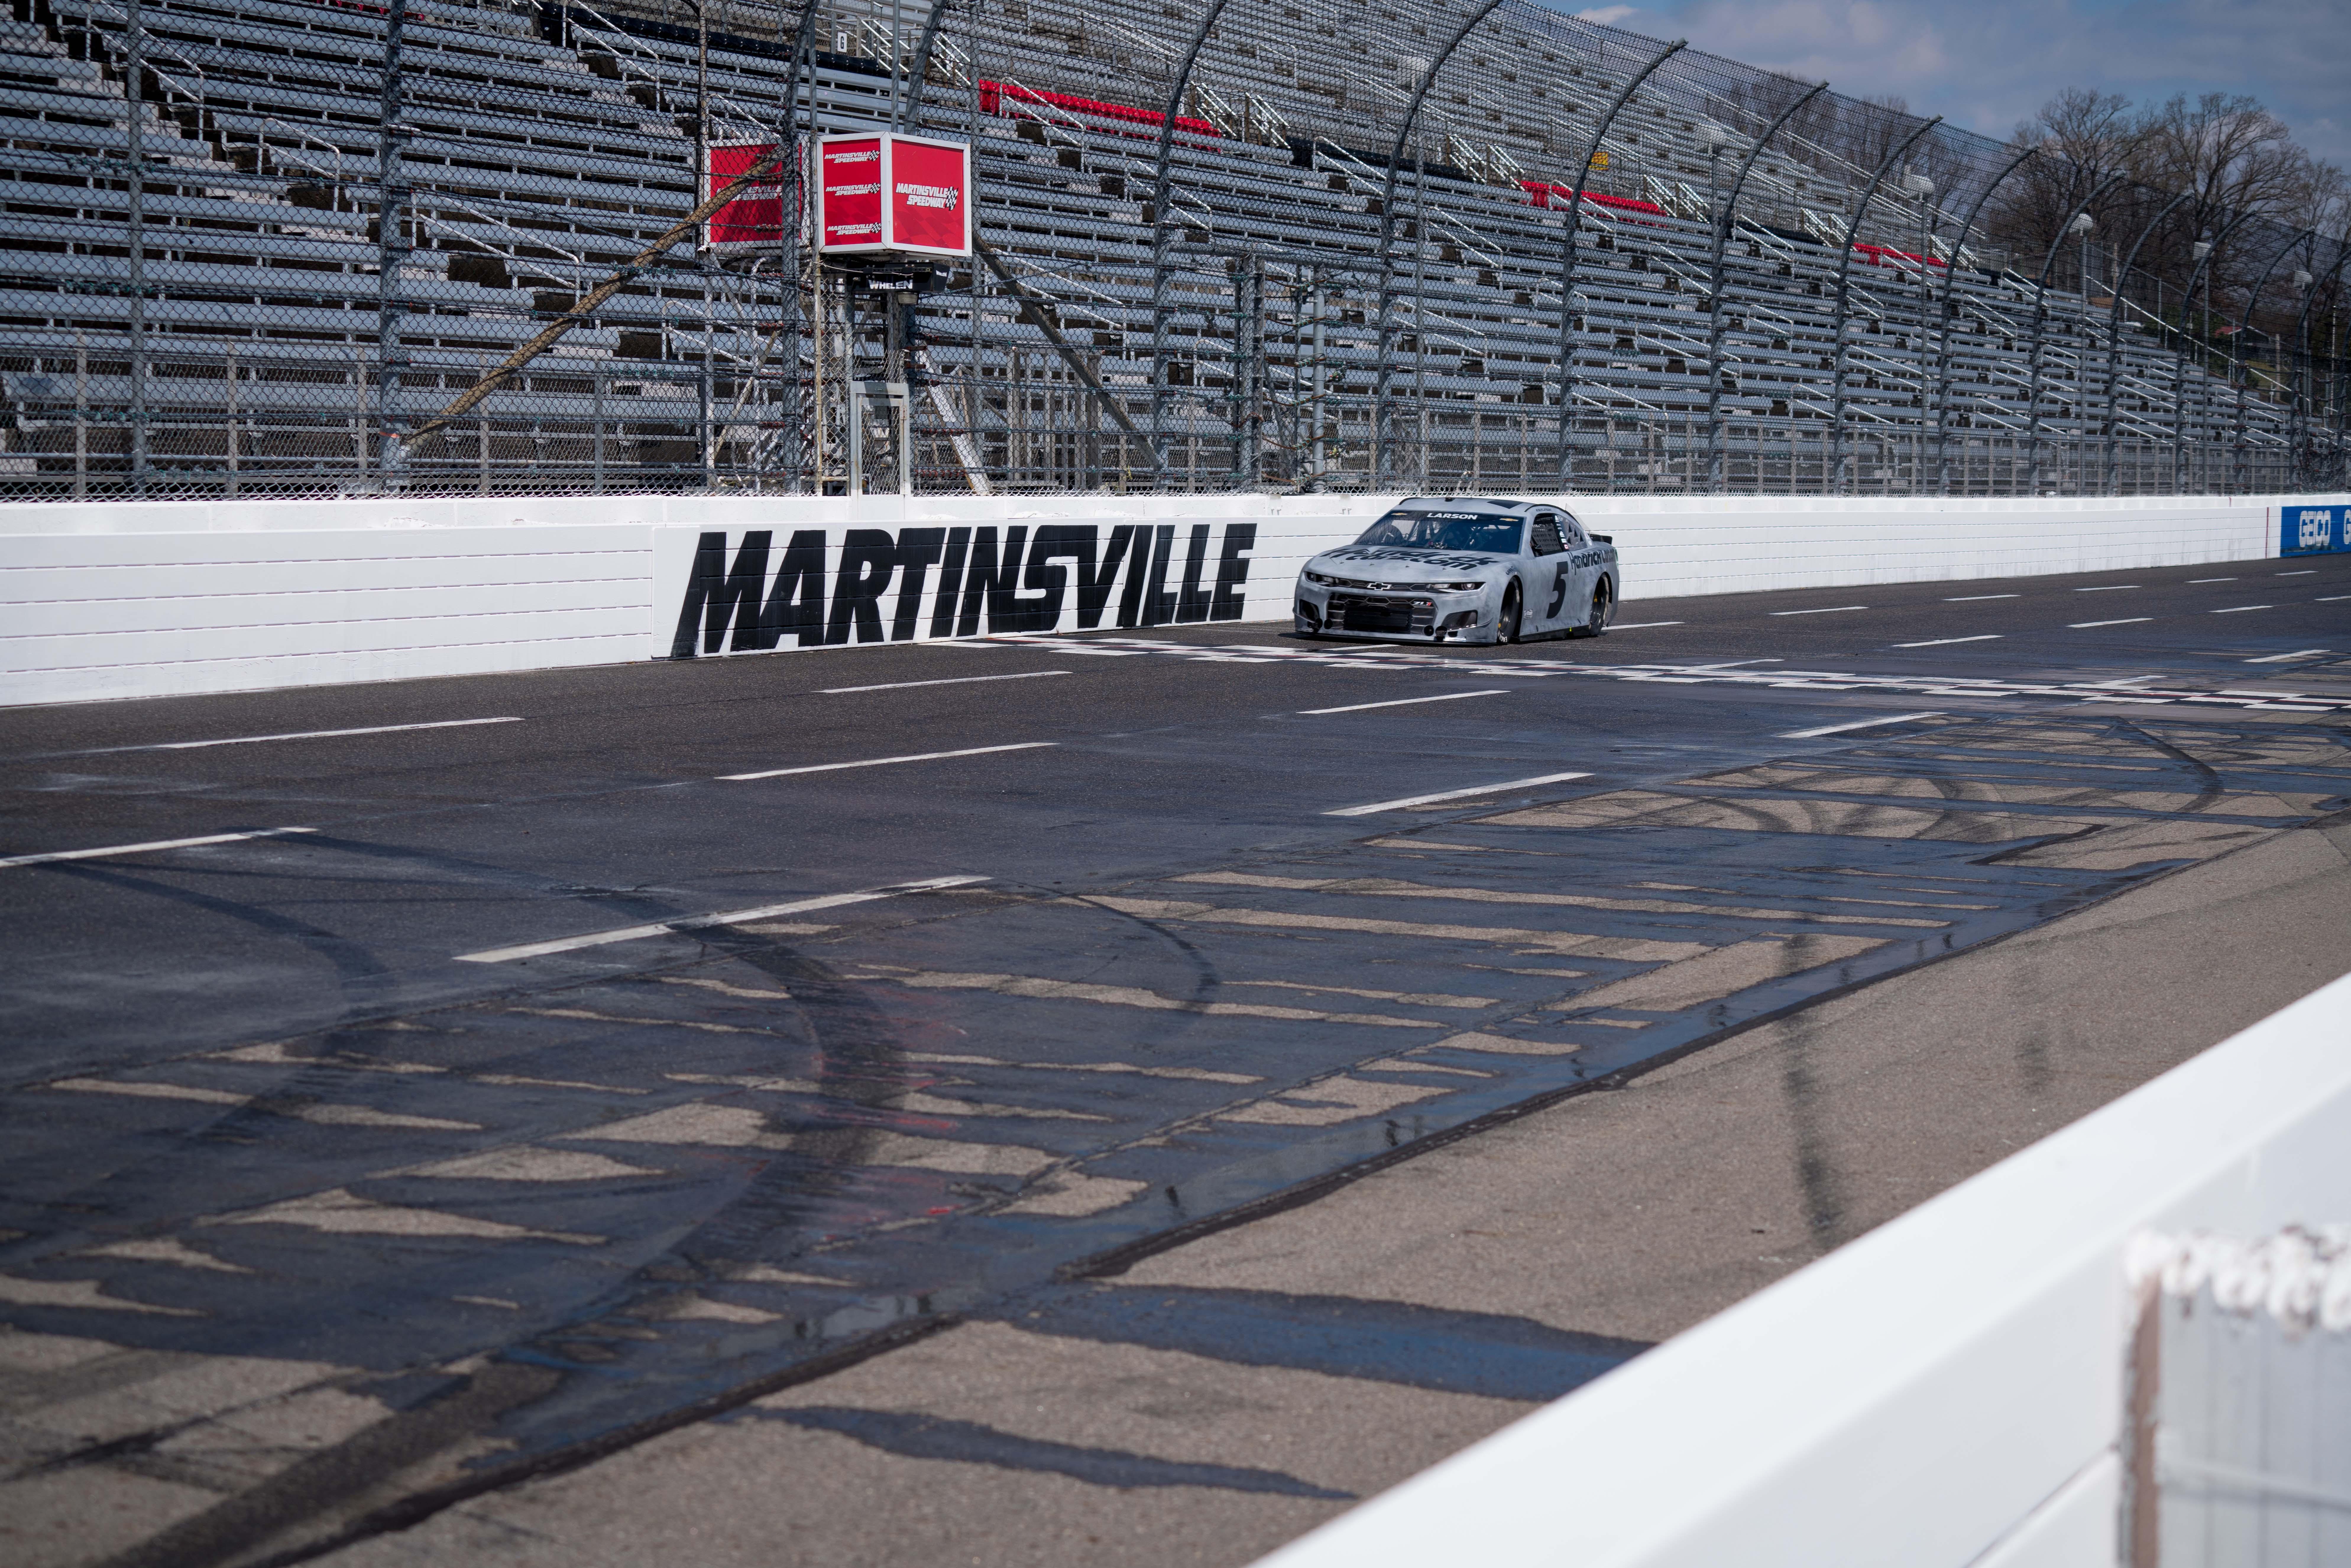 Kyle Larson - NASCAR rain tires at Martinsville Speedway